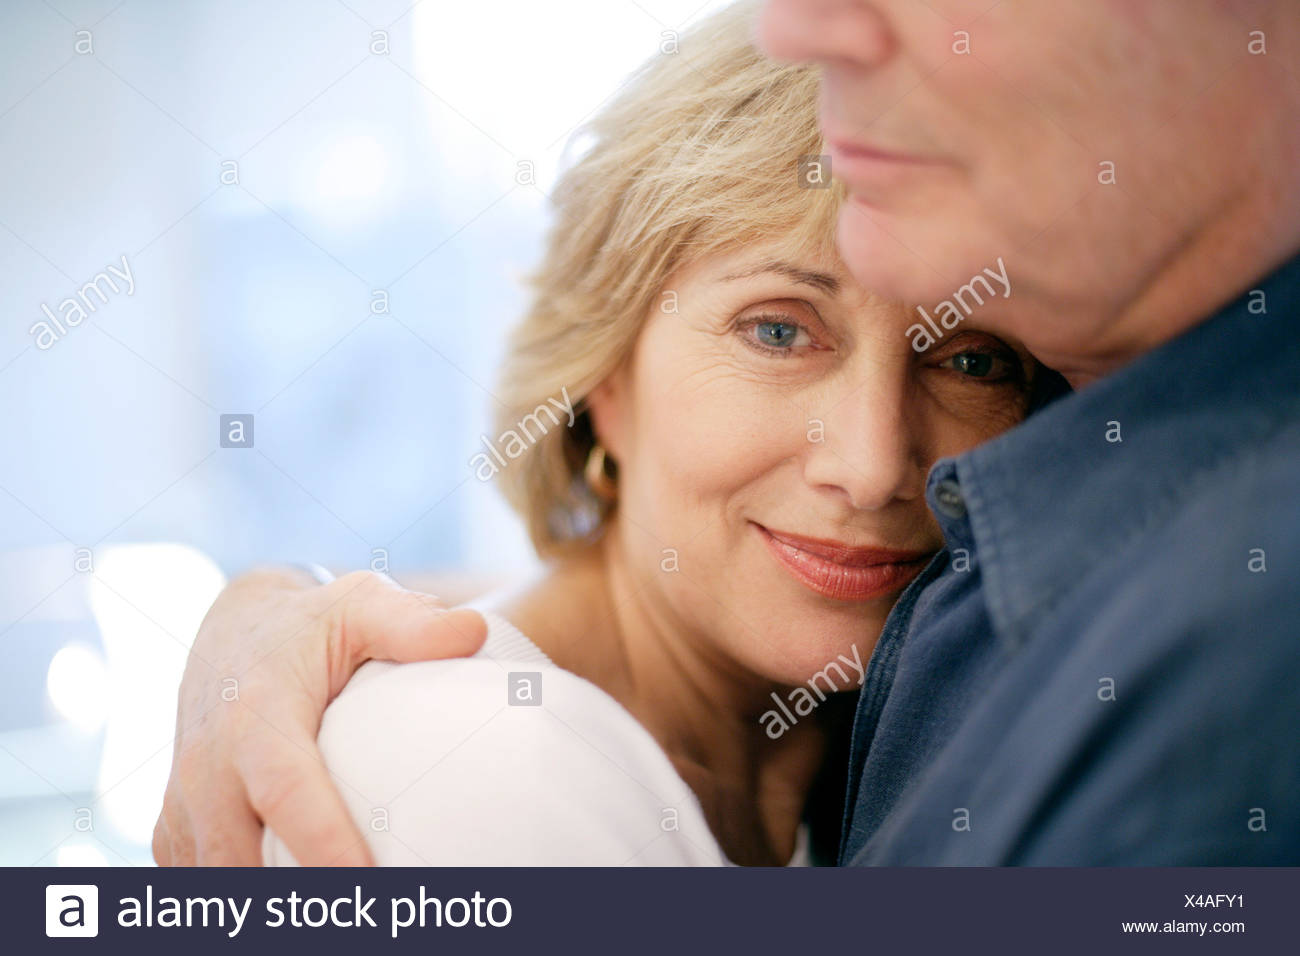 Couple embracing. - Stock Image